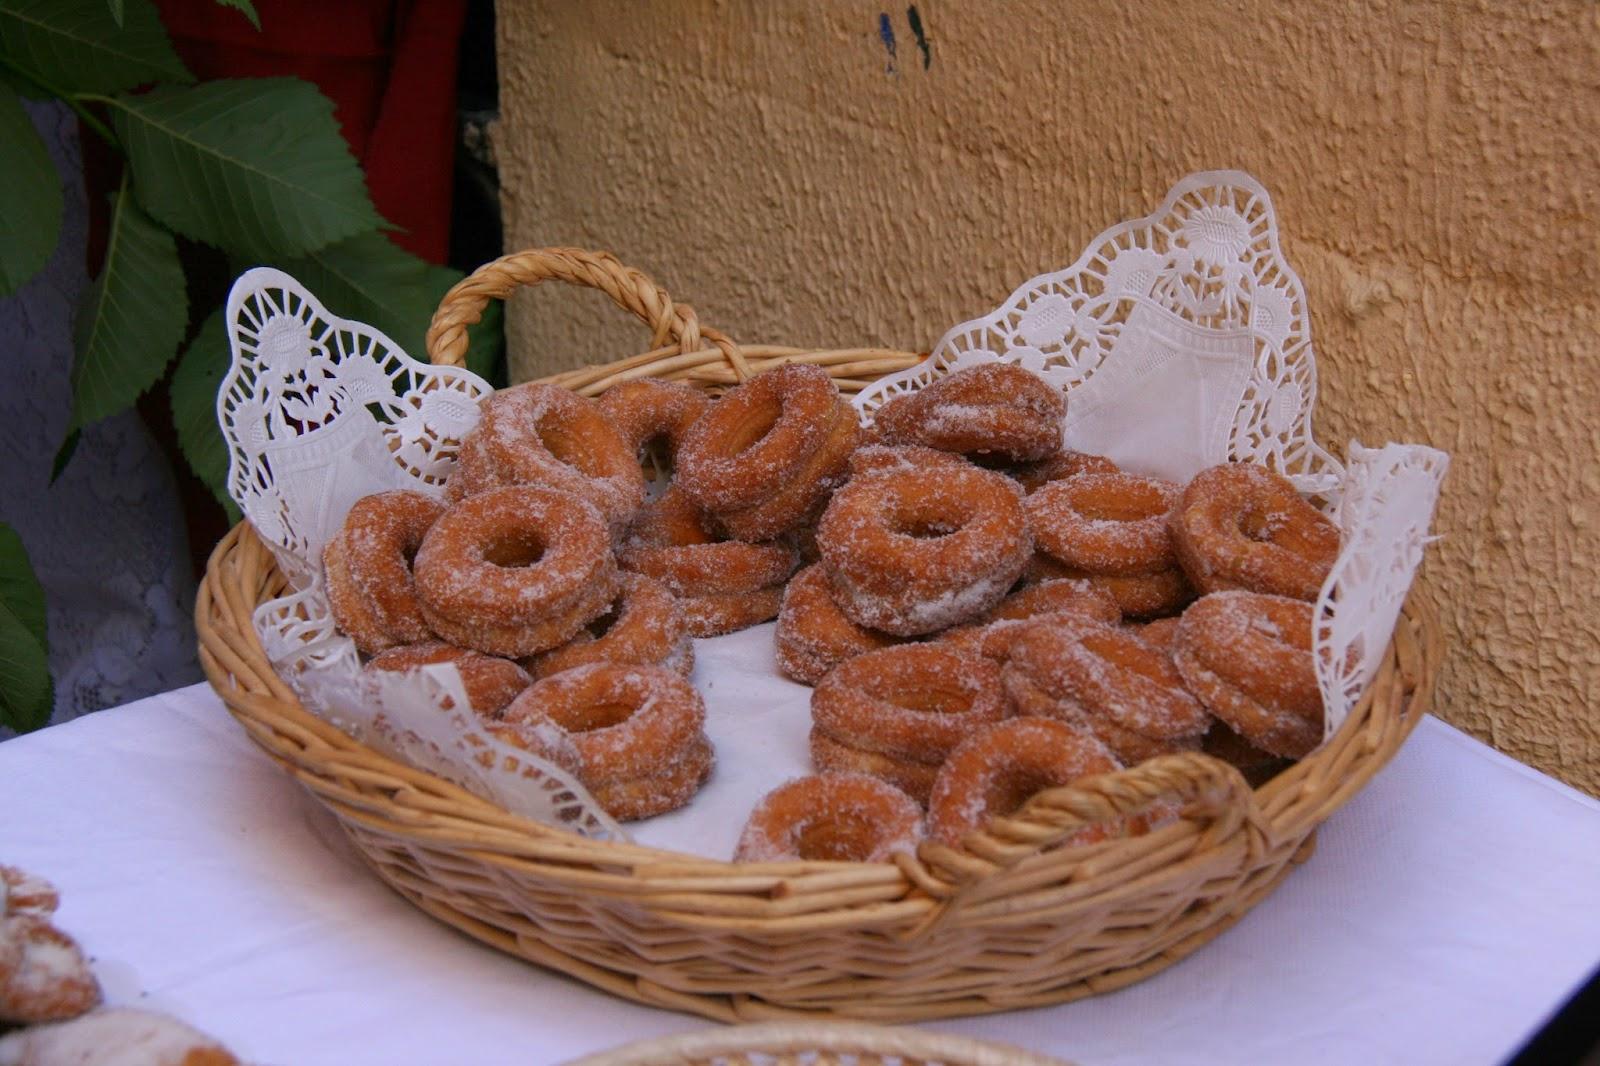 El plato t pico dulces y reposter a for Platos dulces